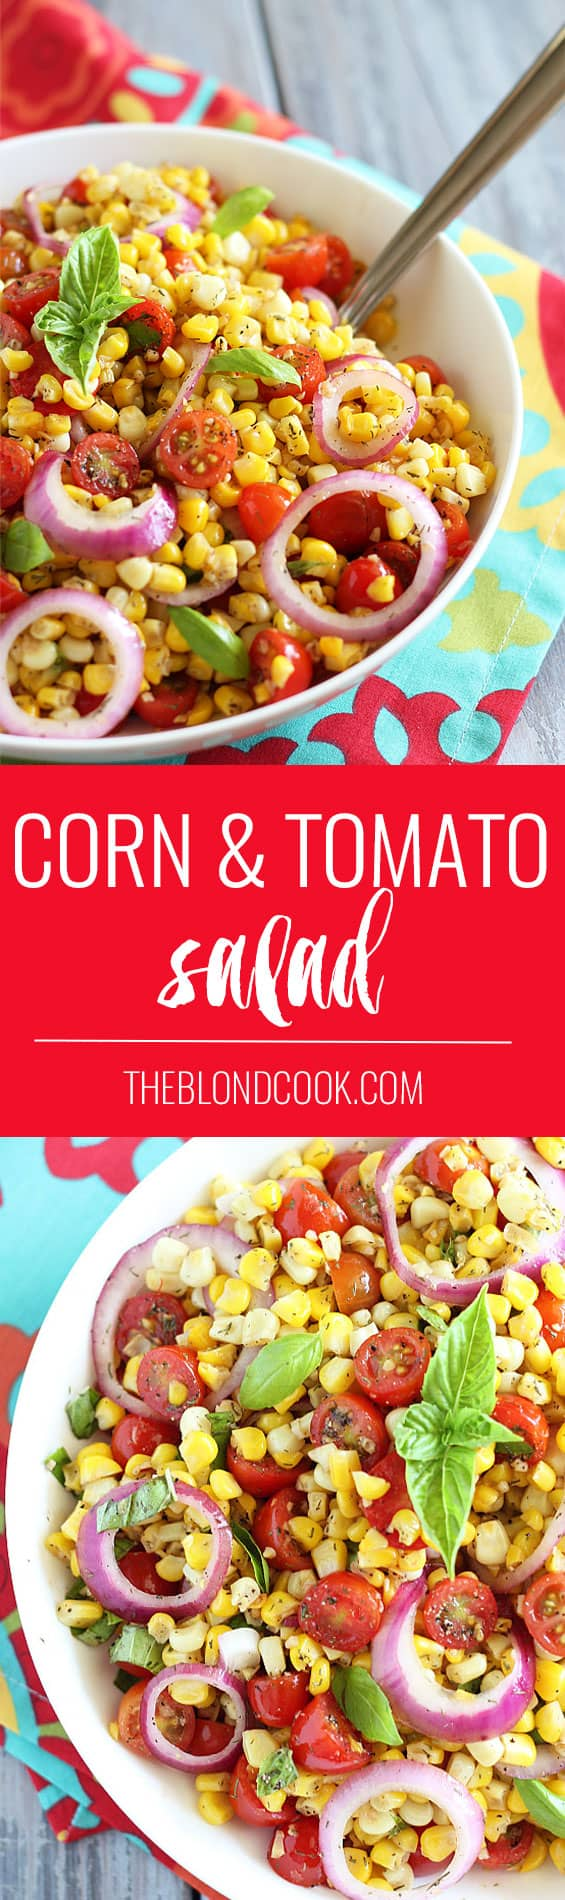 Corn and Tomato Salad | theblondcook.com